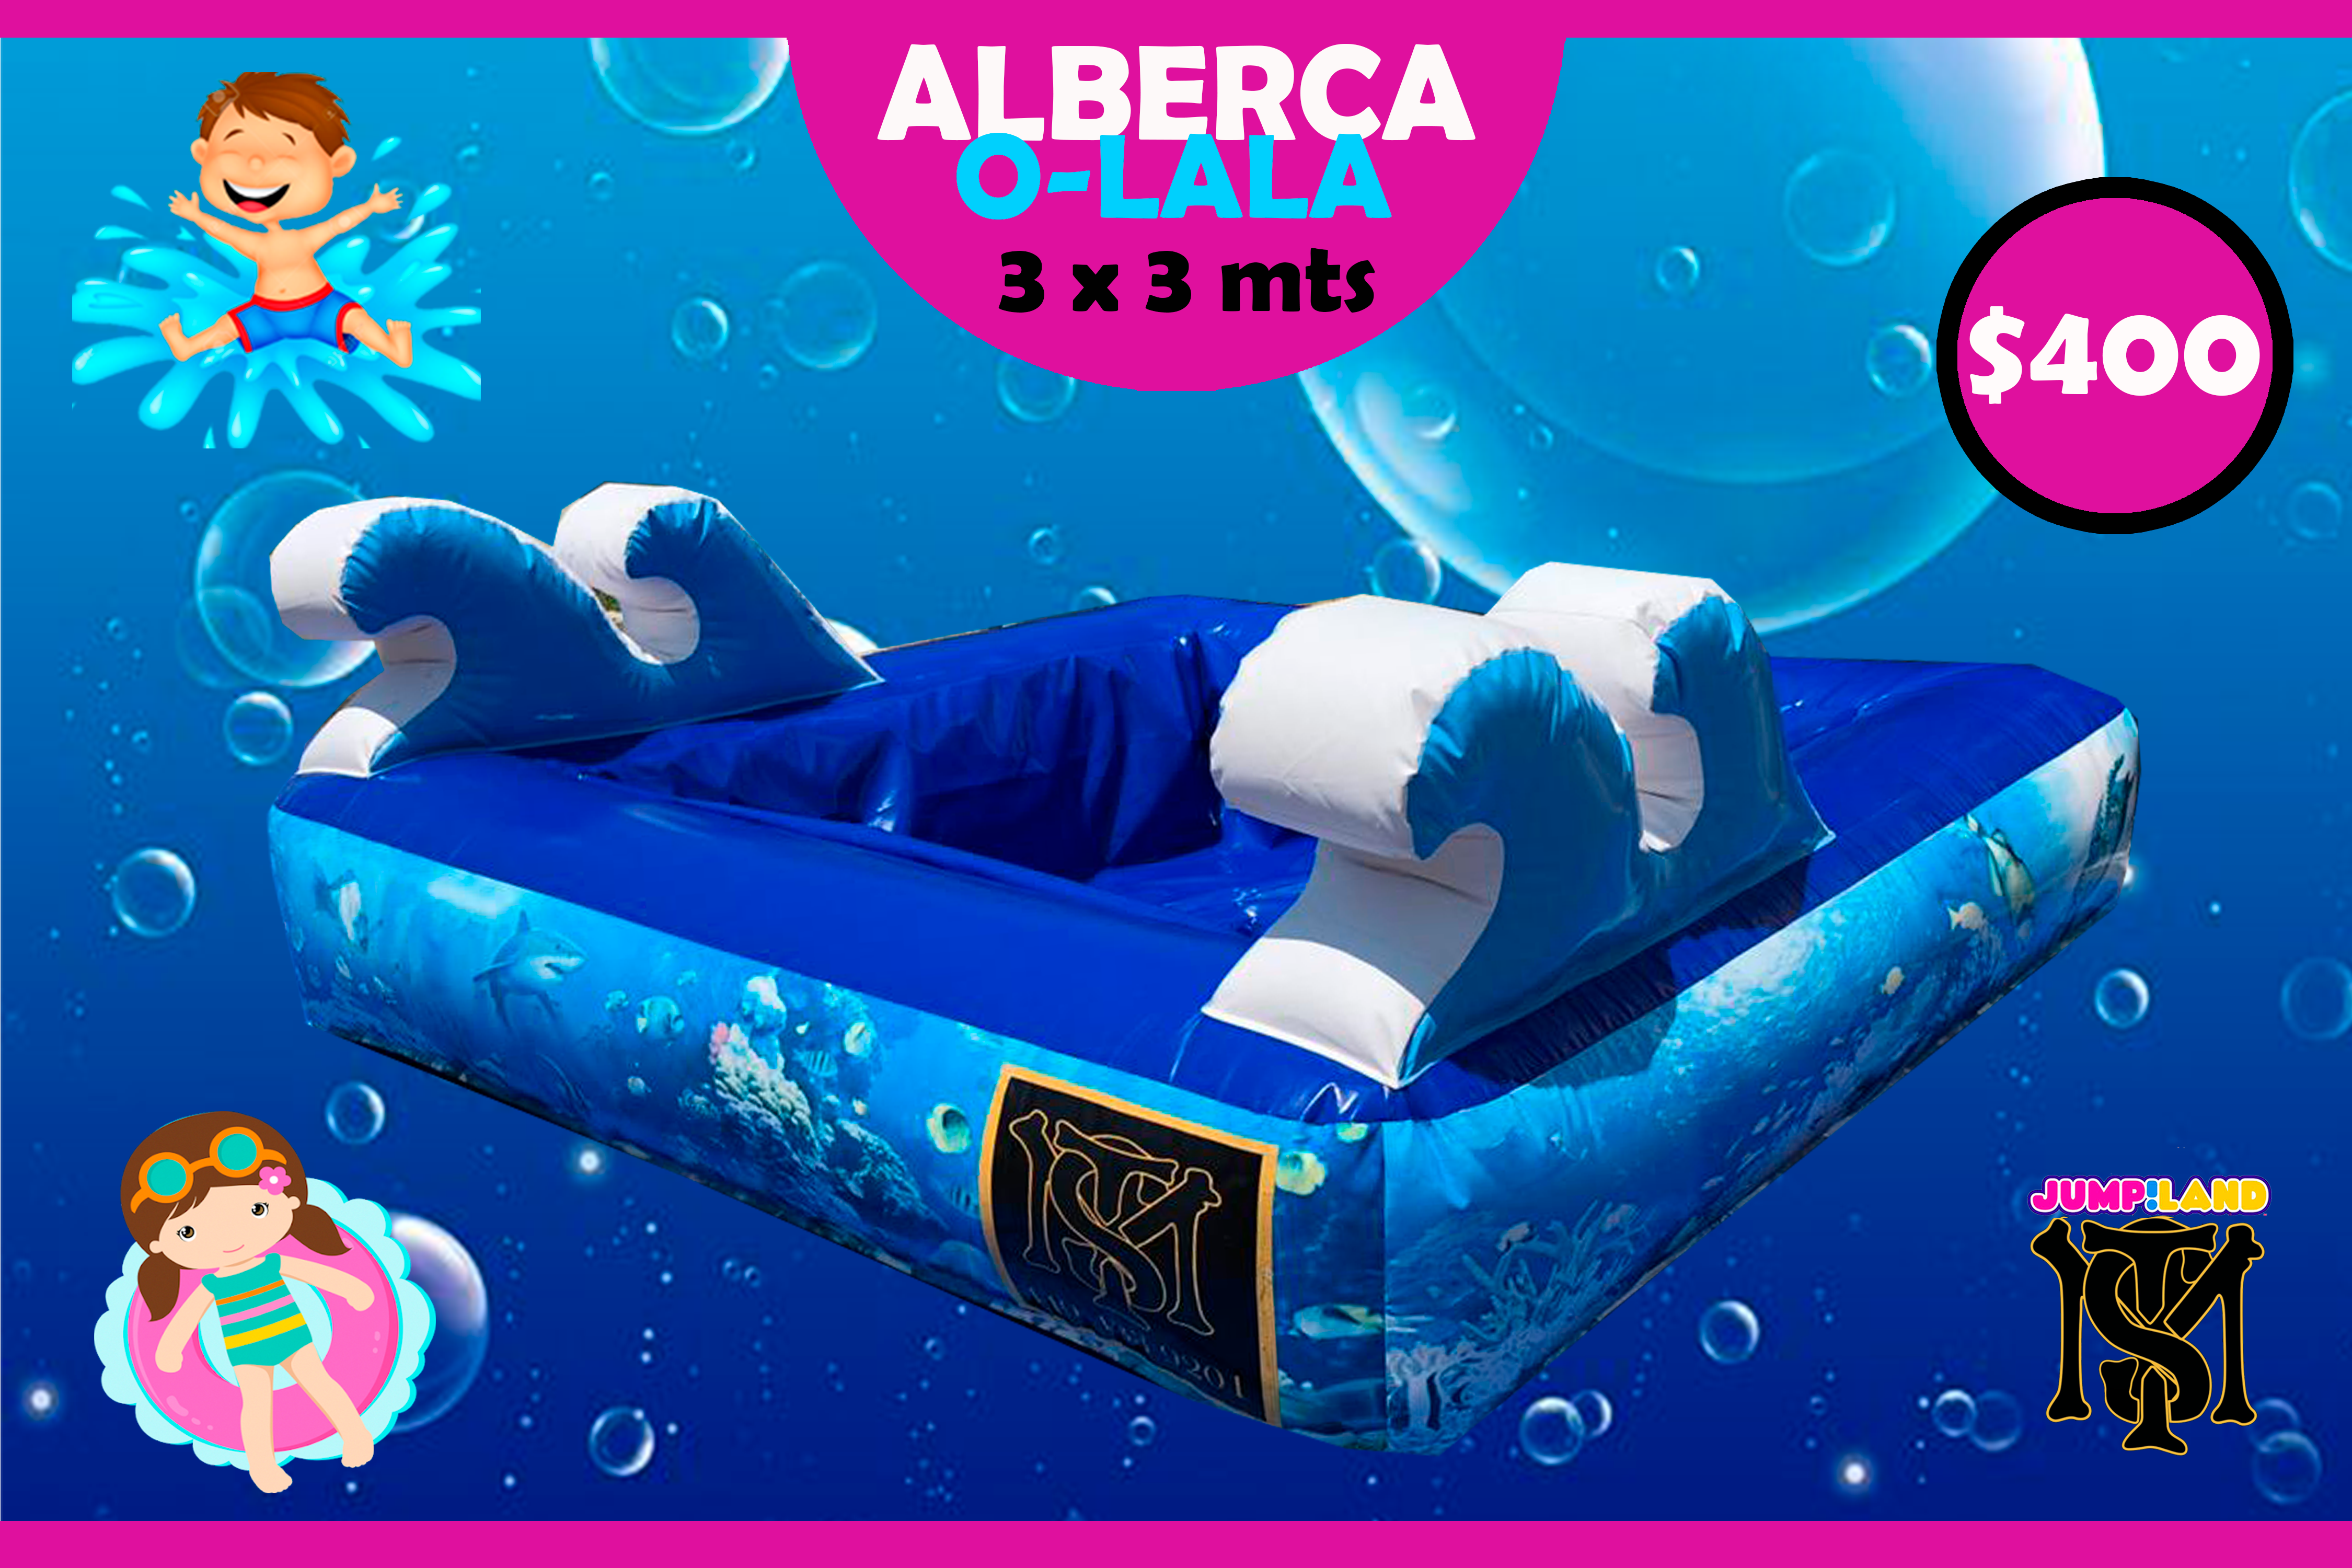 Alberca Inflable O-lala